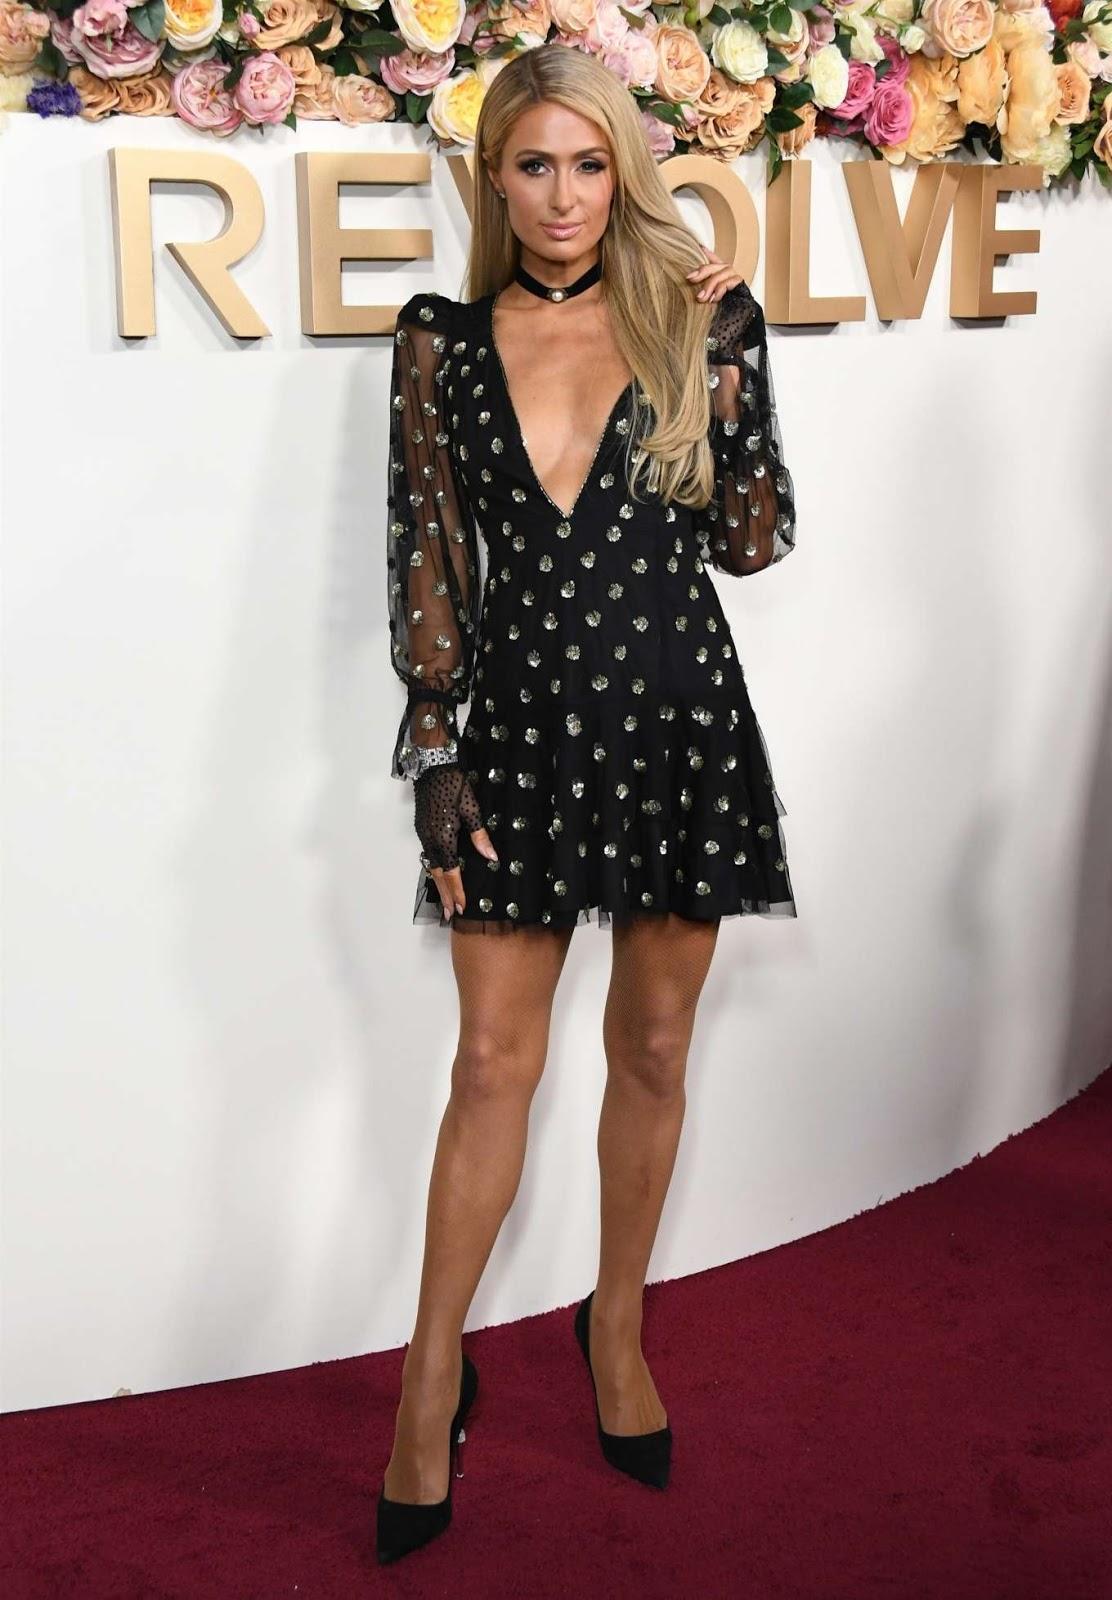 Paris Hilton – 2019 REVOLVE awards in West Hollywood